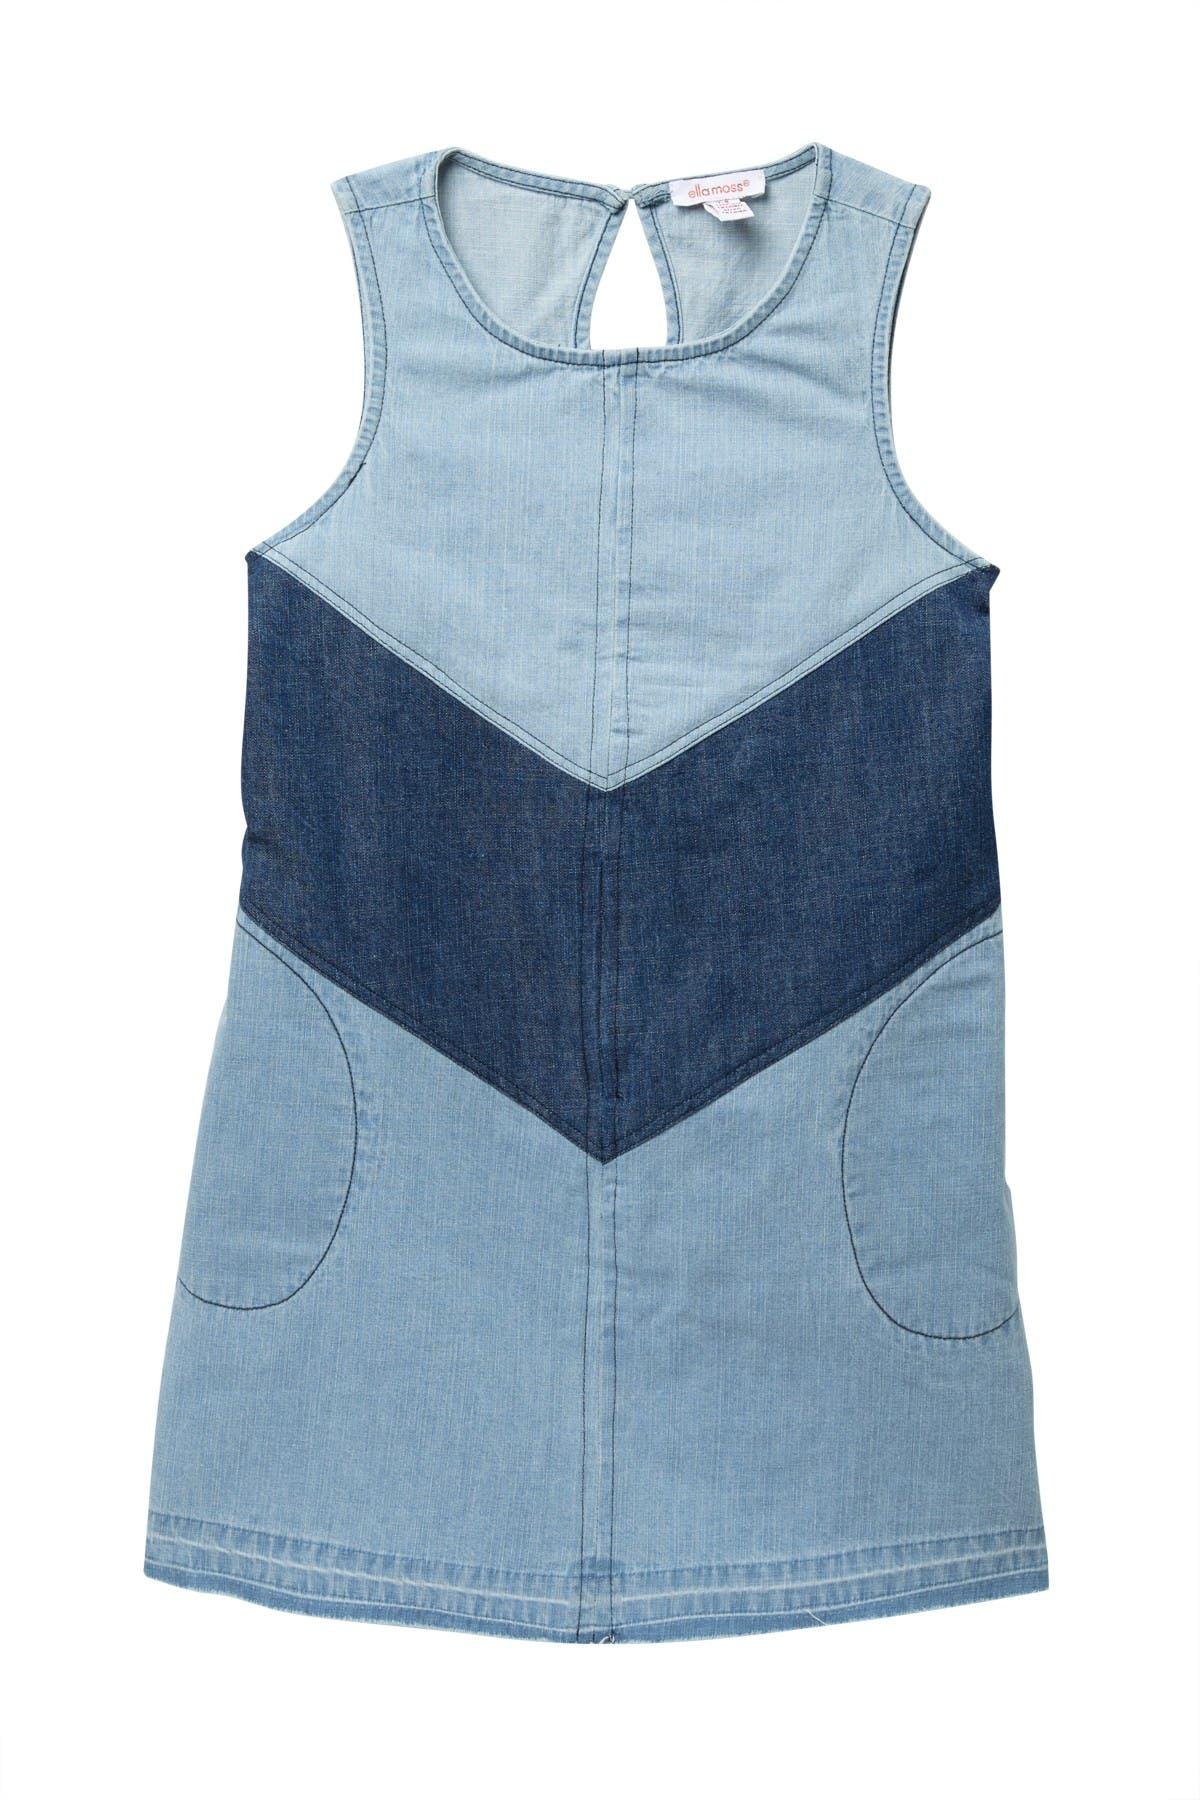 Image of Ella Moss Tiered Denim Dress